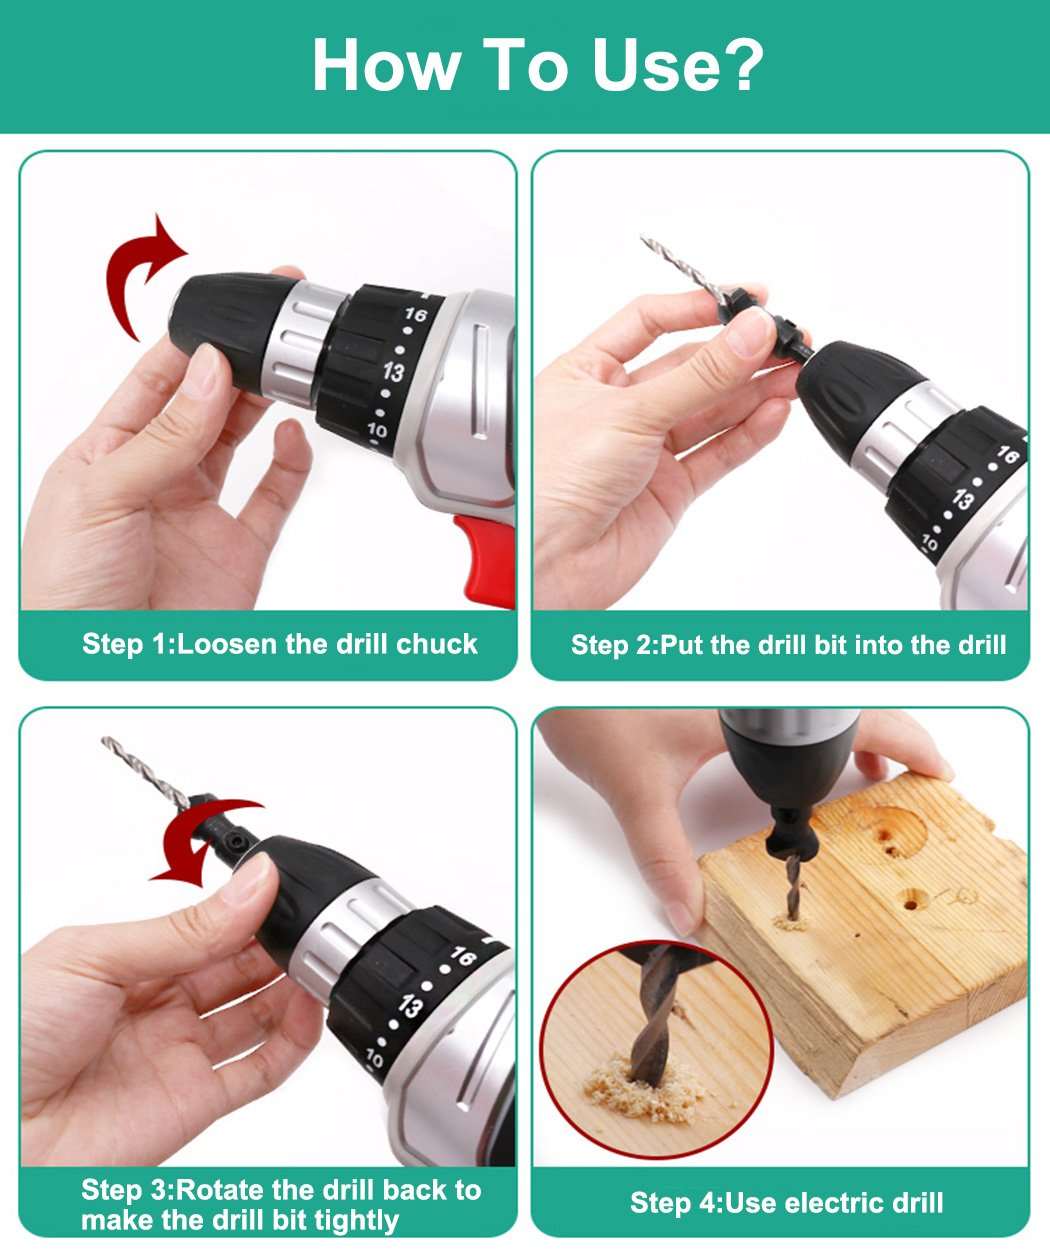 OCGIG 4 Pcs 1//4 Hex Shank Countersink Drill Bit Set for Woodworking 8 6 12 10